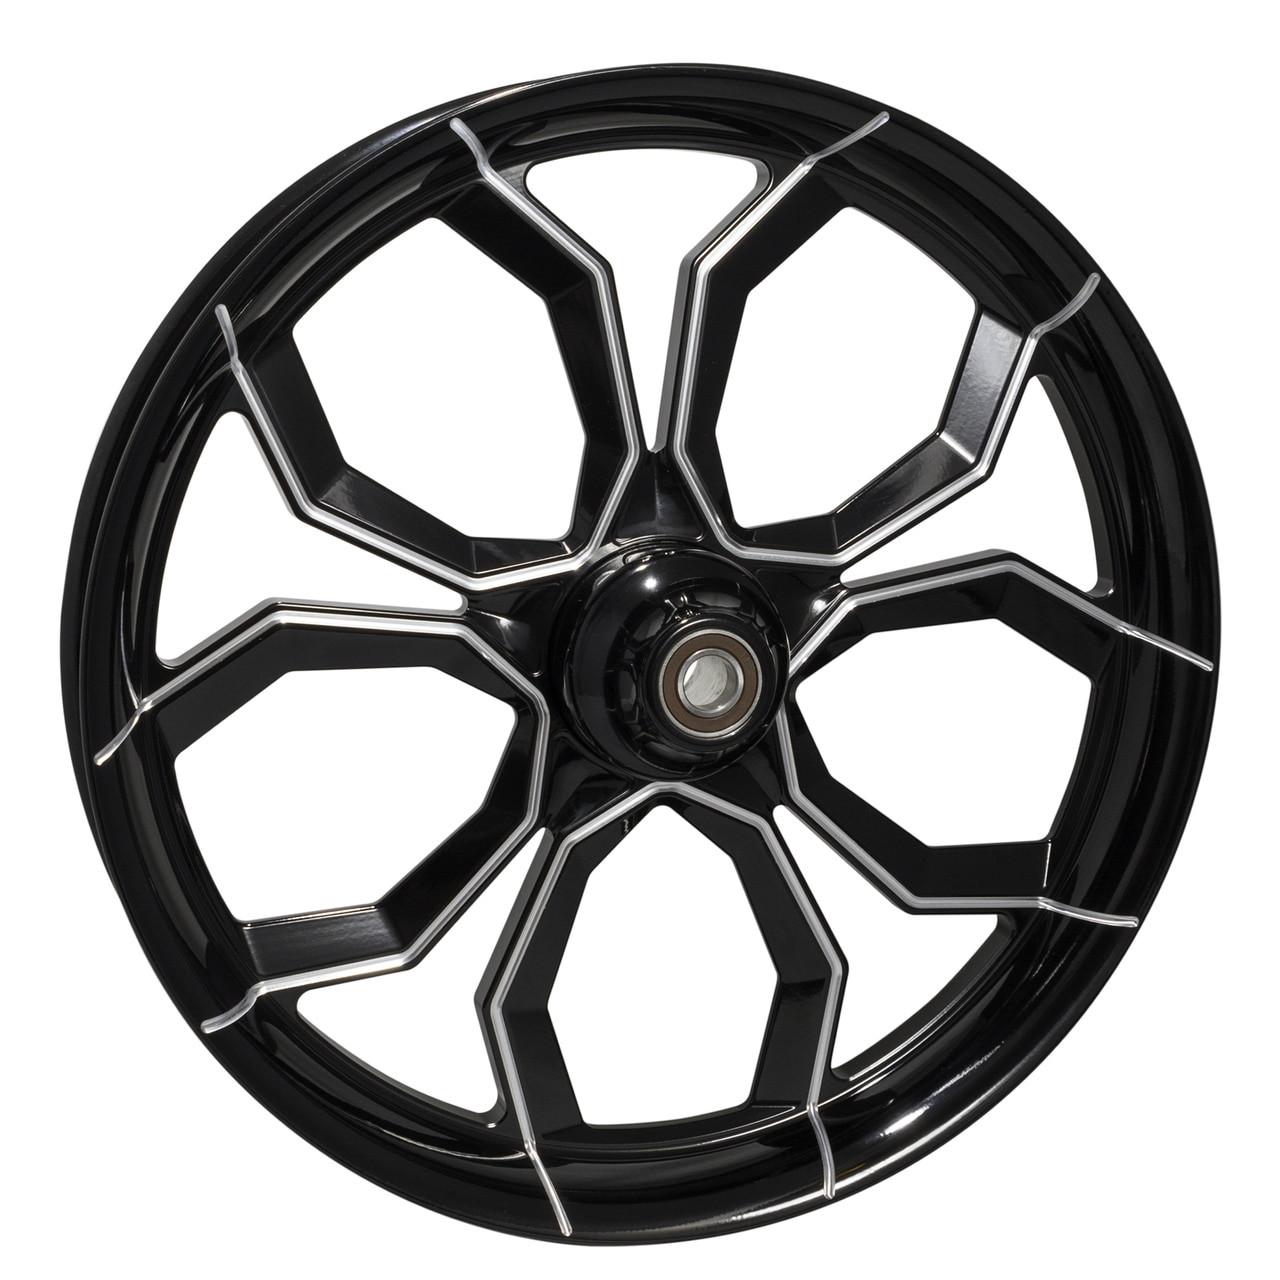 Black Contrast Trike, Tri Glide, Freewheeler Wheels